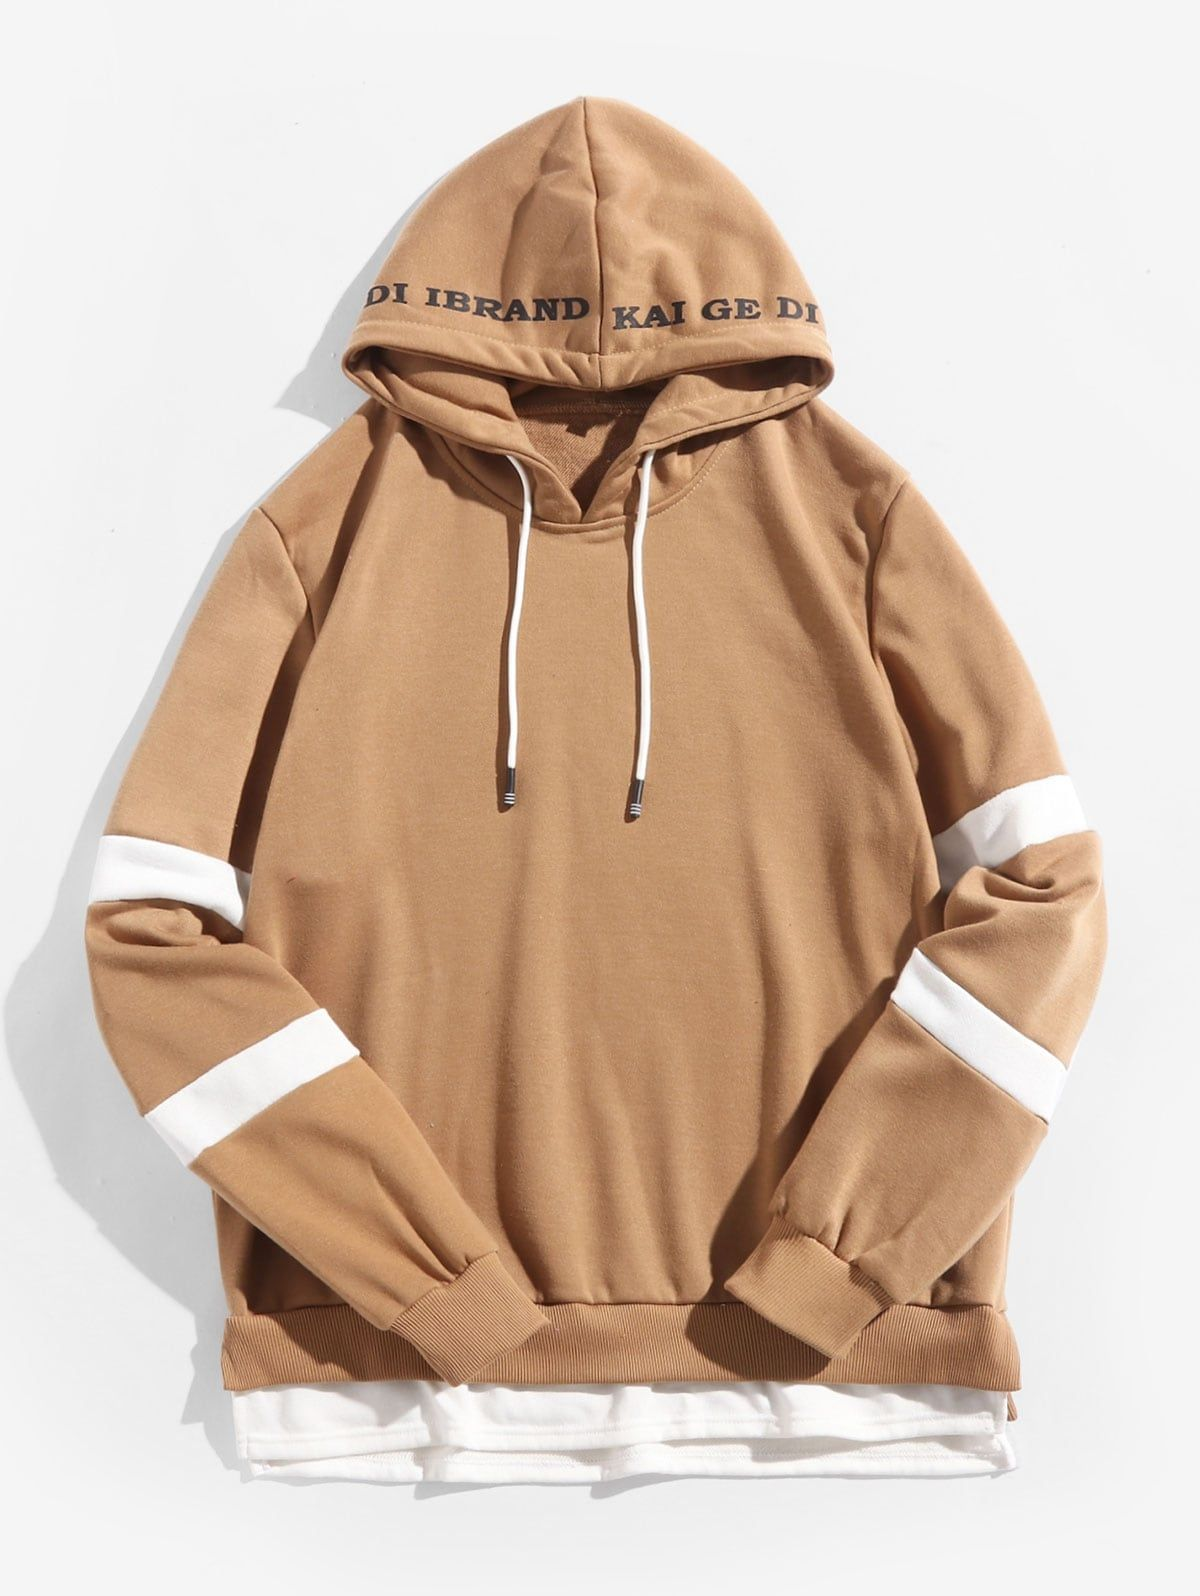 S-Fly Women Fashion Kangaroo Pocket Love Print Hoodie Pullover Sweatshirt